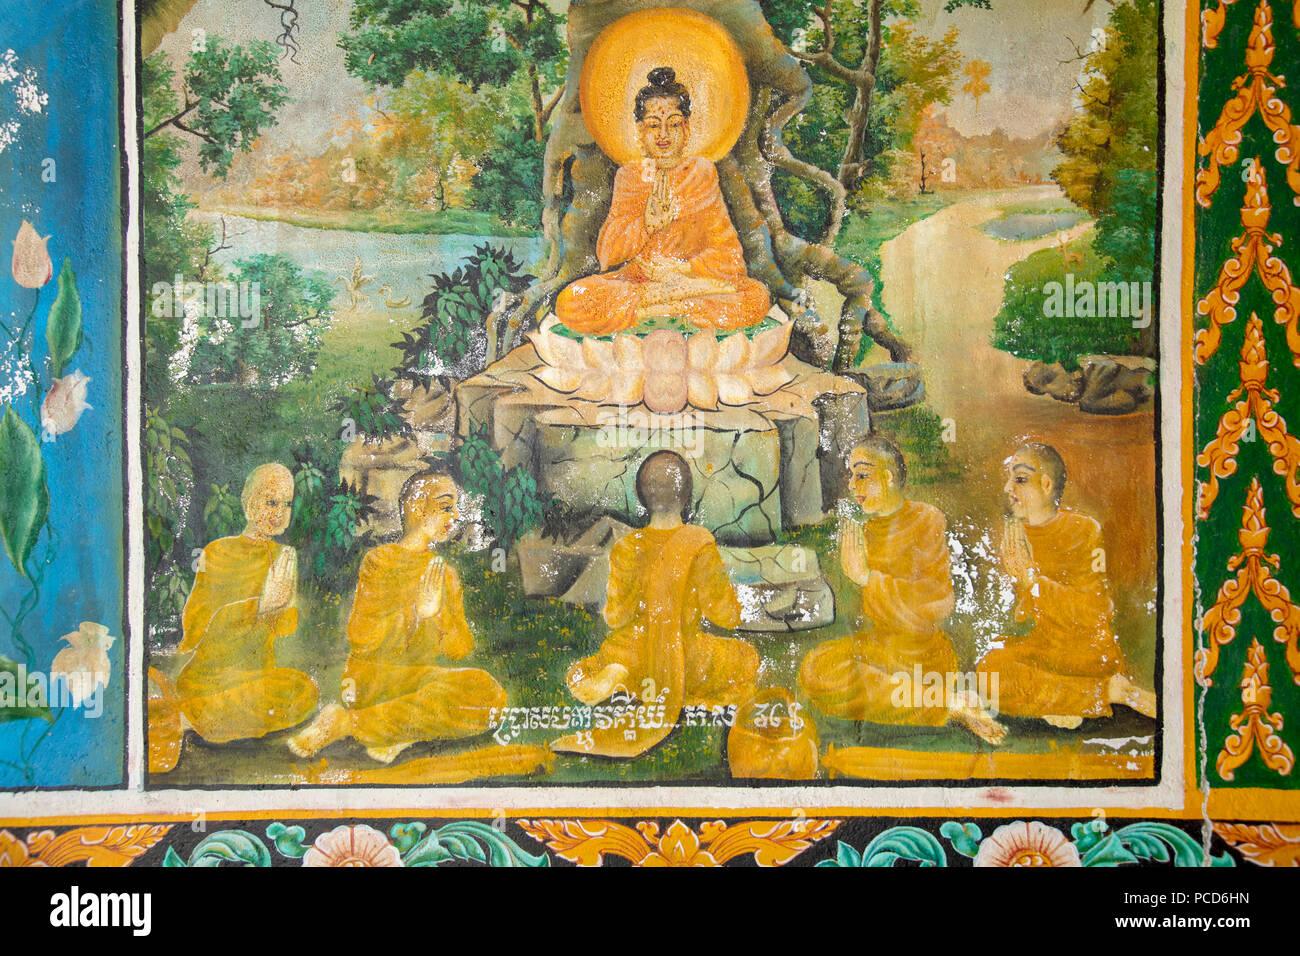 Wandgemälde mit Szenen aus dem Leben des Buddha, Takeo, Kambodscha, Indochina, Südostasien, Asien Stockbild